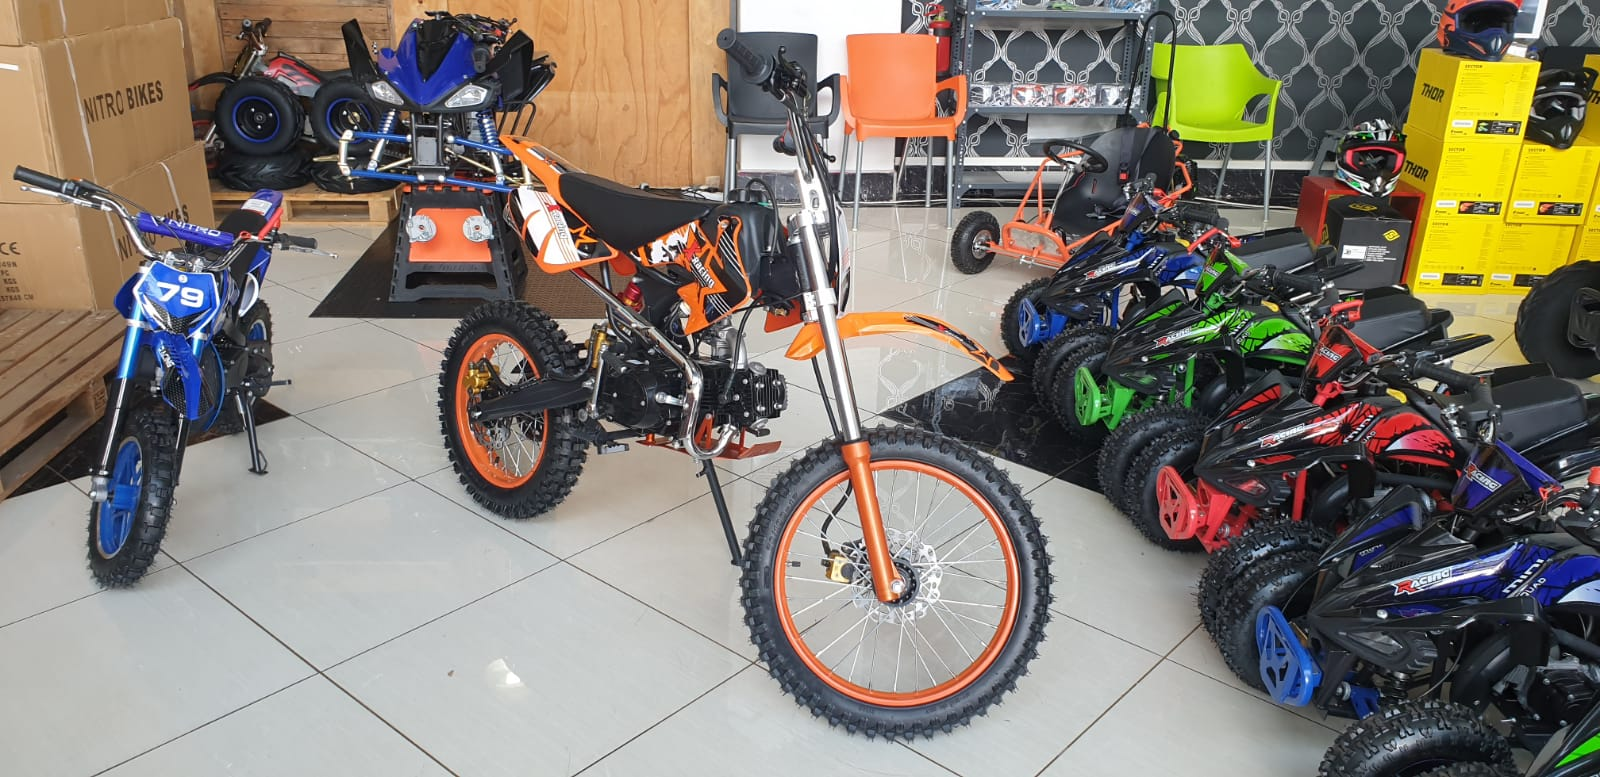 DB BIKE'S LENASIA - OFF ROAD BIKES - ATV'S & ACCESSORIES